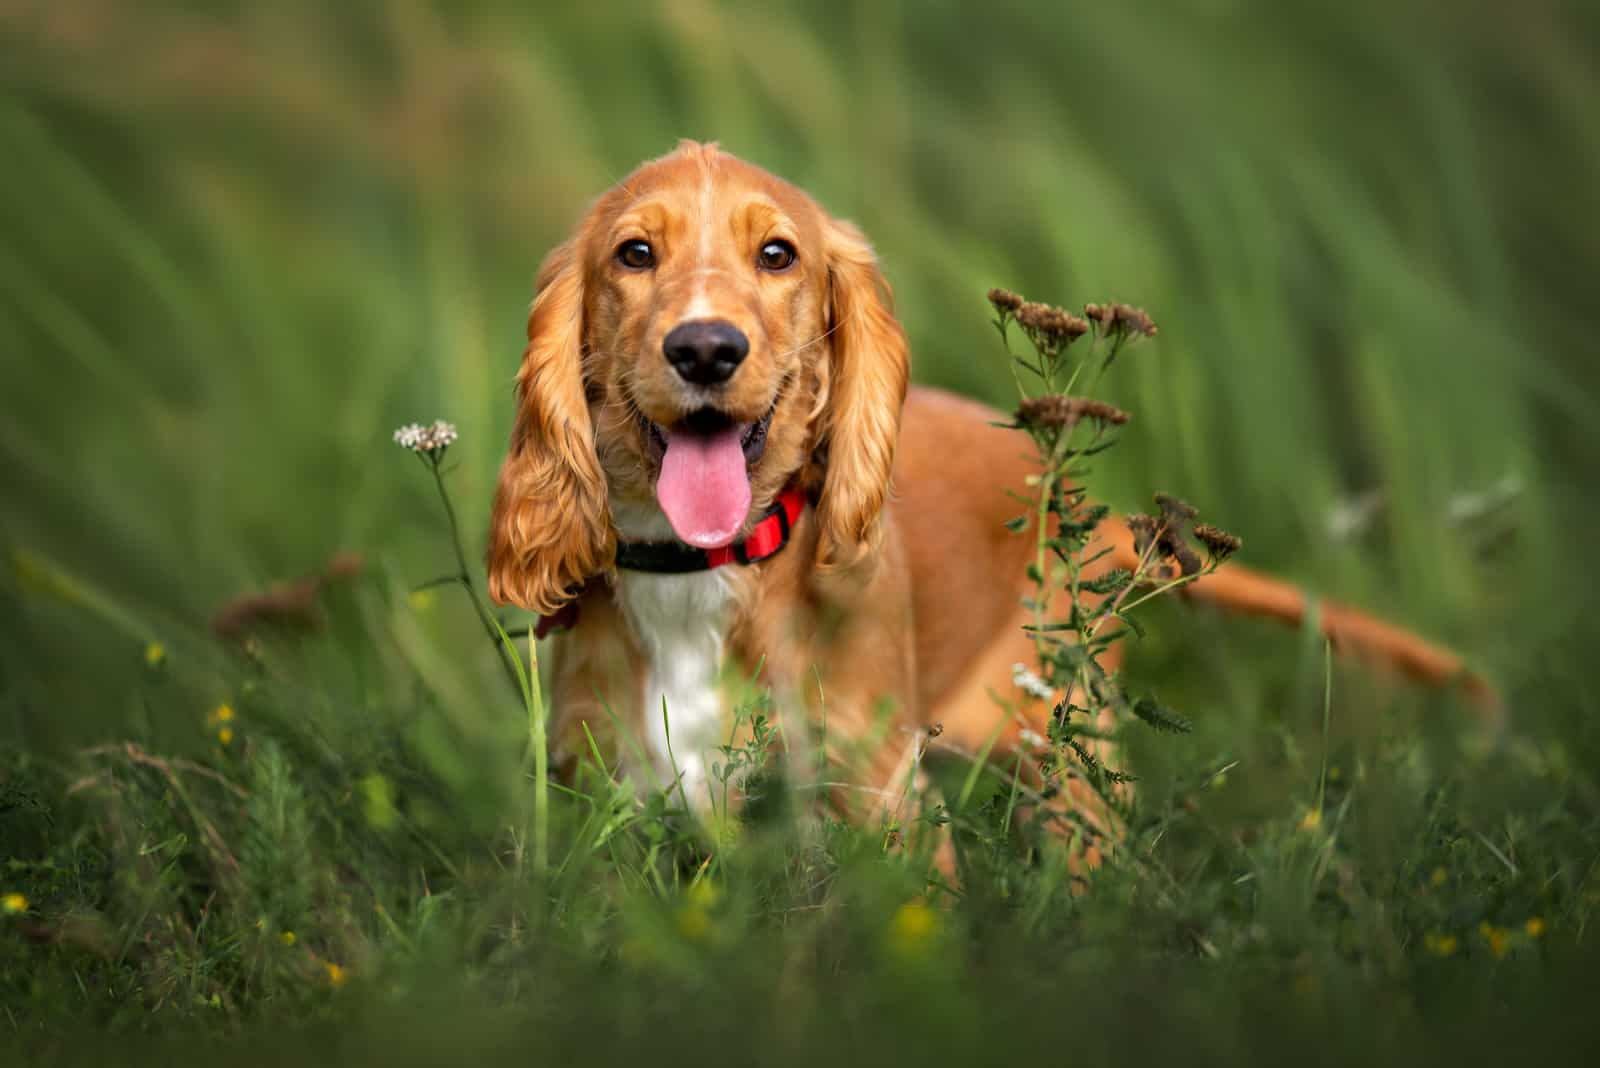 happy red cocker spaniel puppy portrait outdoors